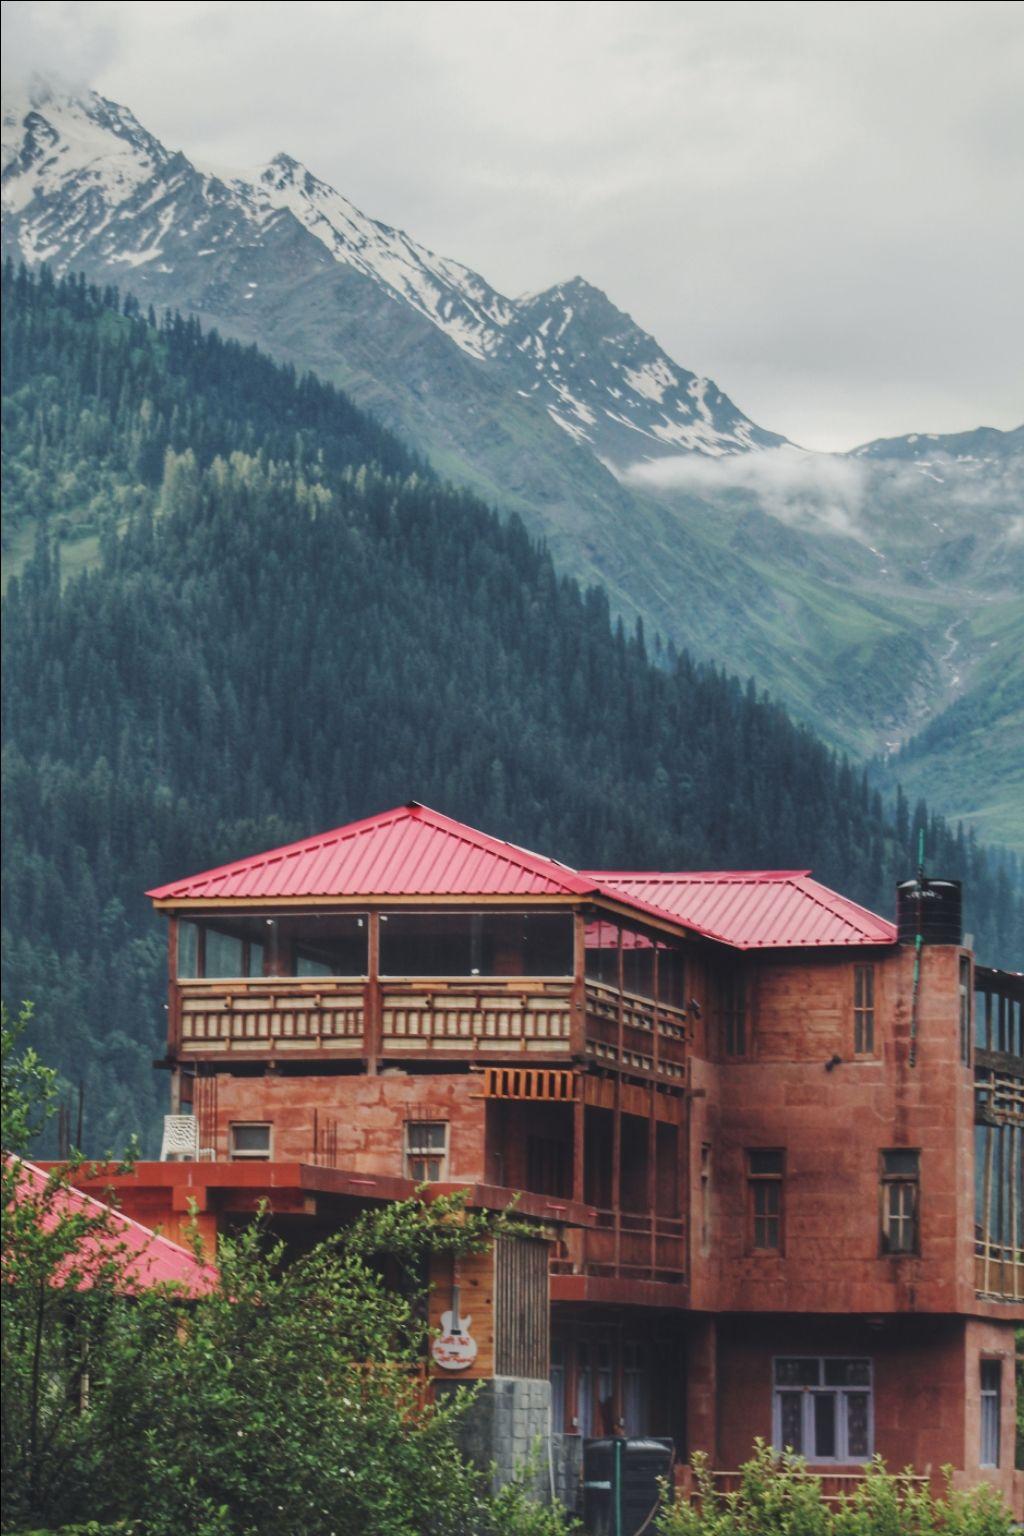 Photo of Kheerganga - Sunshine Himalayan Camp By M'hmd Athif